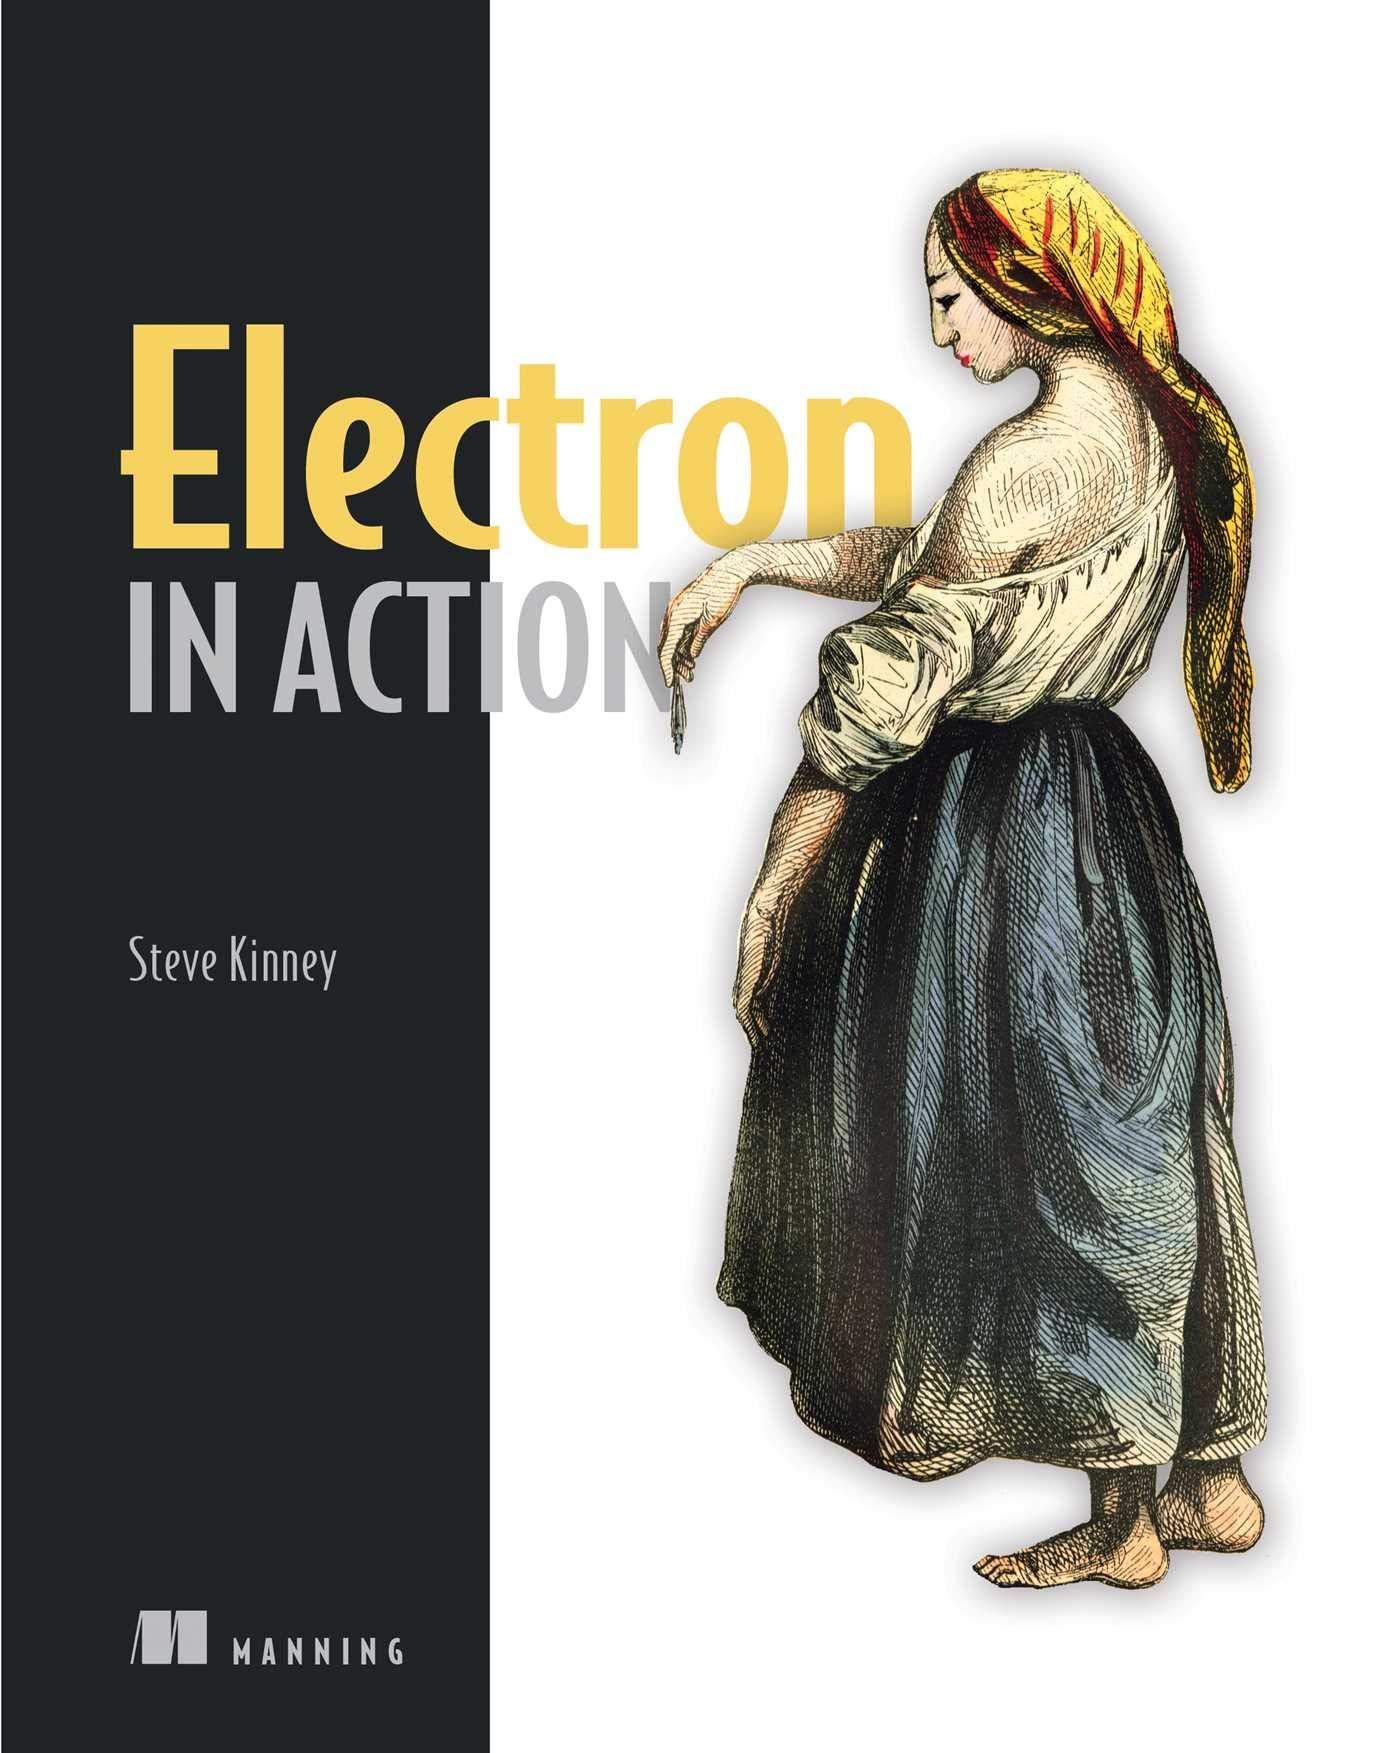 Electron in Action: Amazon.es: Kinney, Steve: Libros en idiomas extranjeros